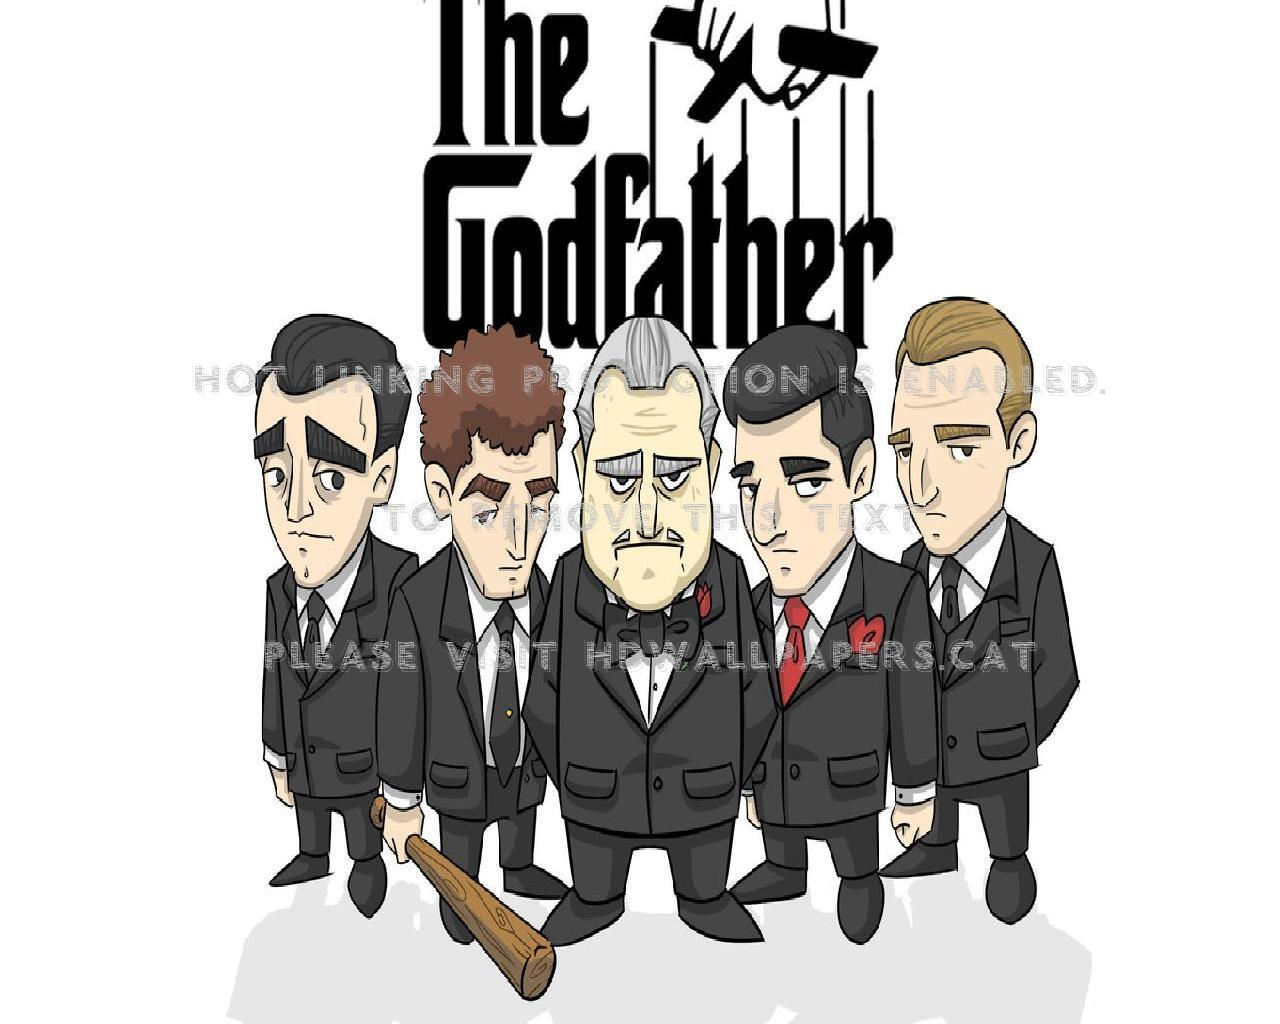 The Godfather Art Tom Hagen Fredo Corleone - Godfather Art - HD Wallpaper